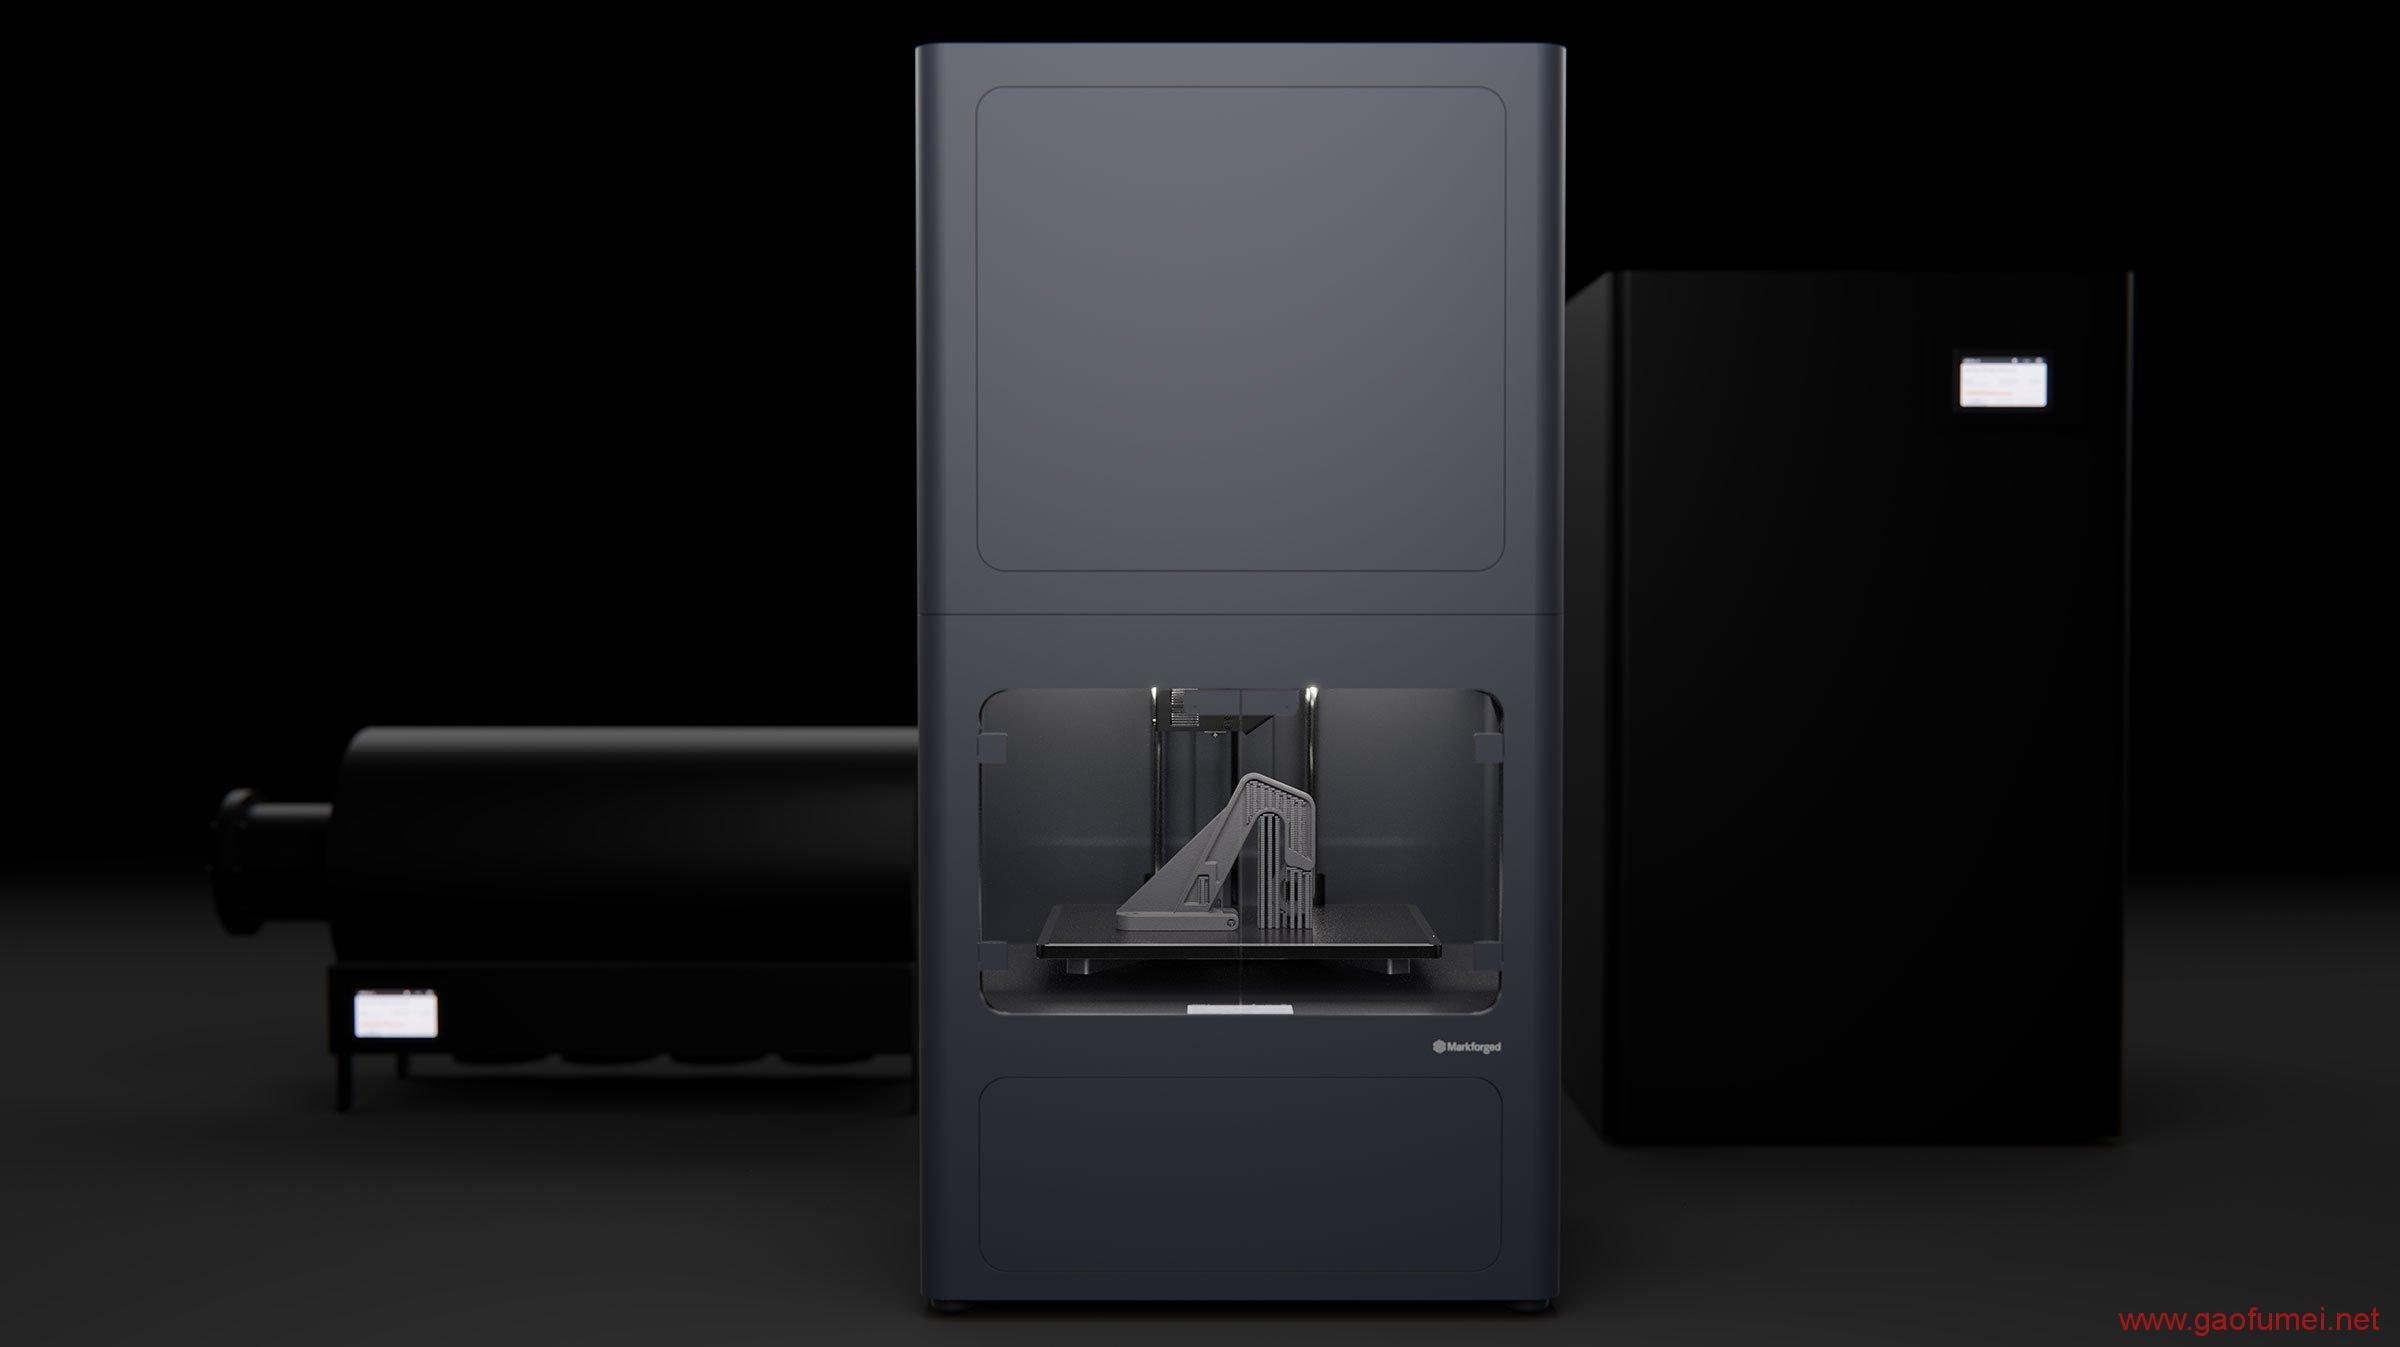 Markforged完成C轮3000万美元融资NASA御用的高性能工业3D打印机 3D打印 第1张-泥人传说